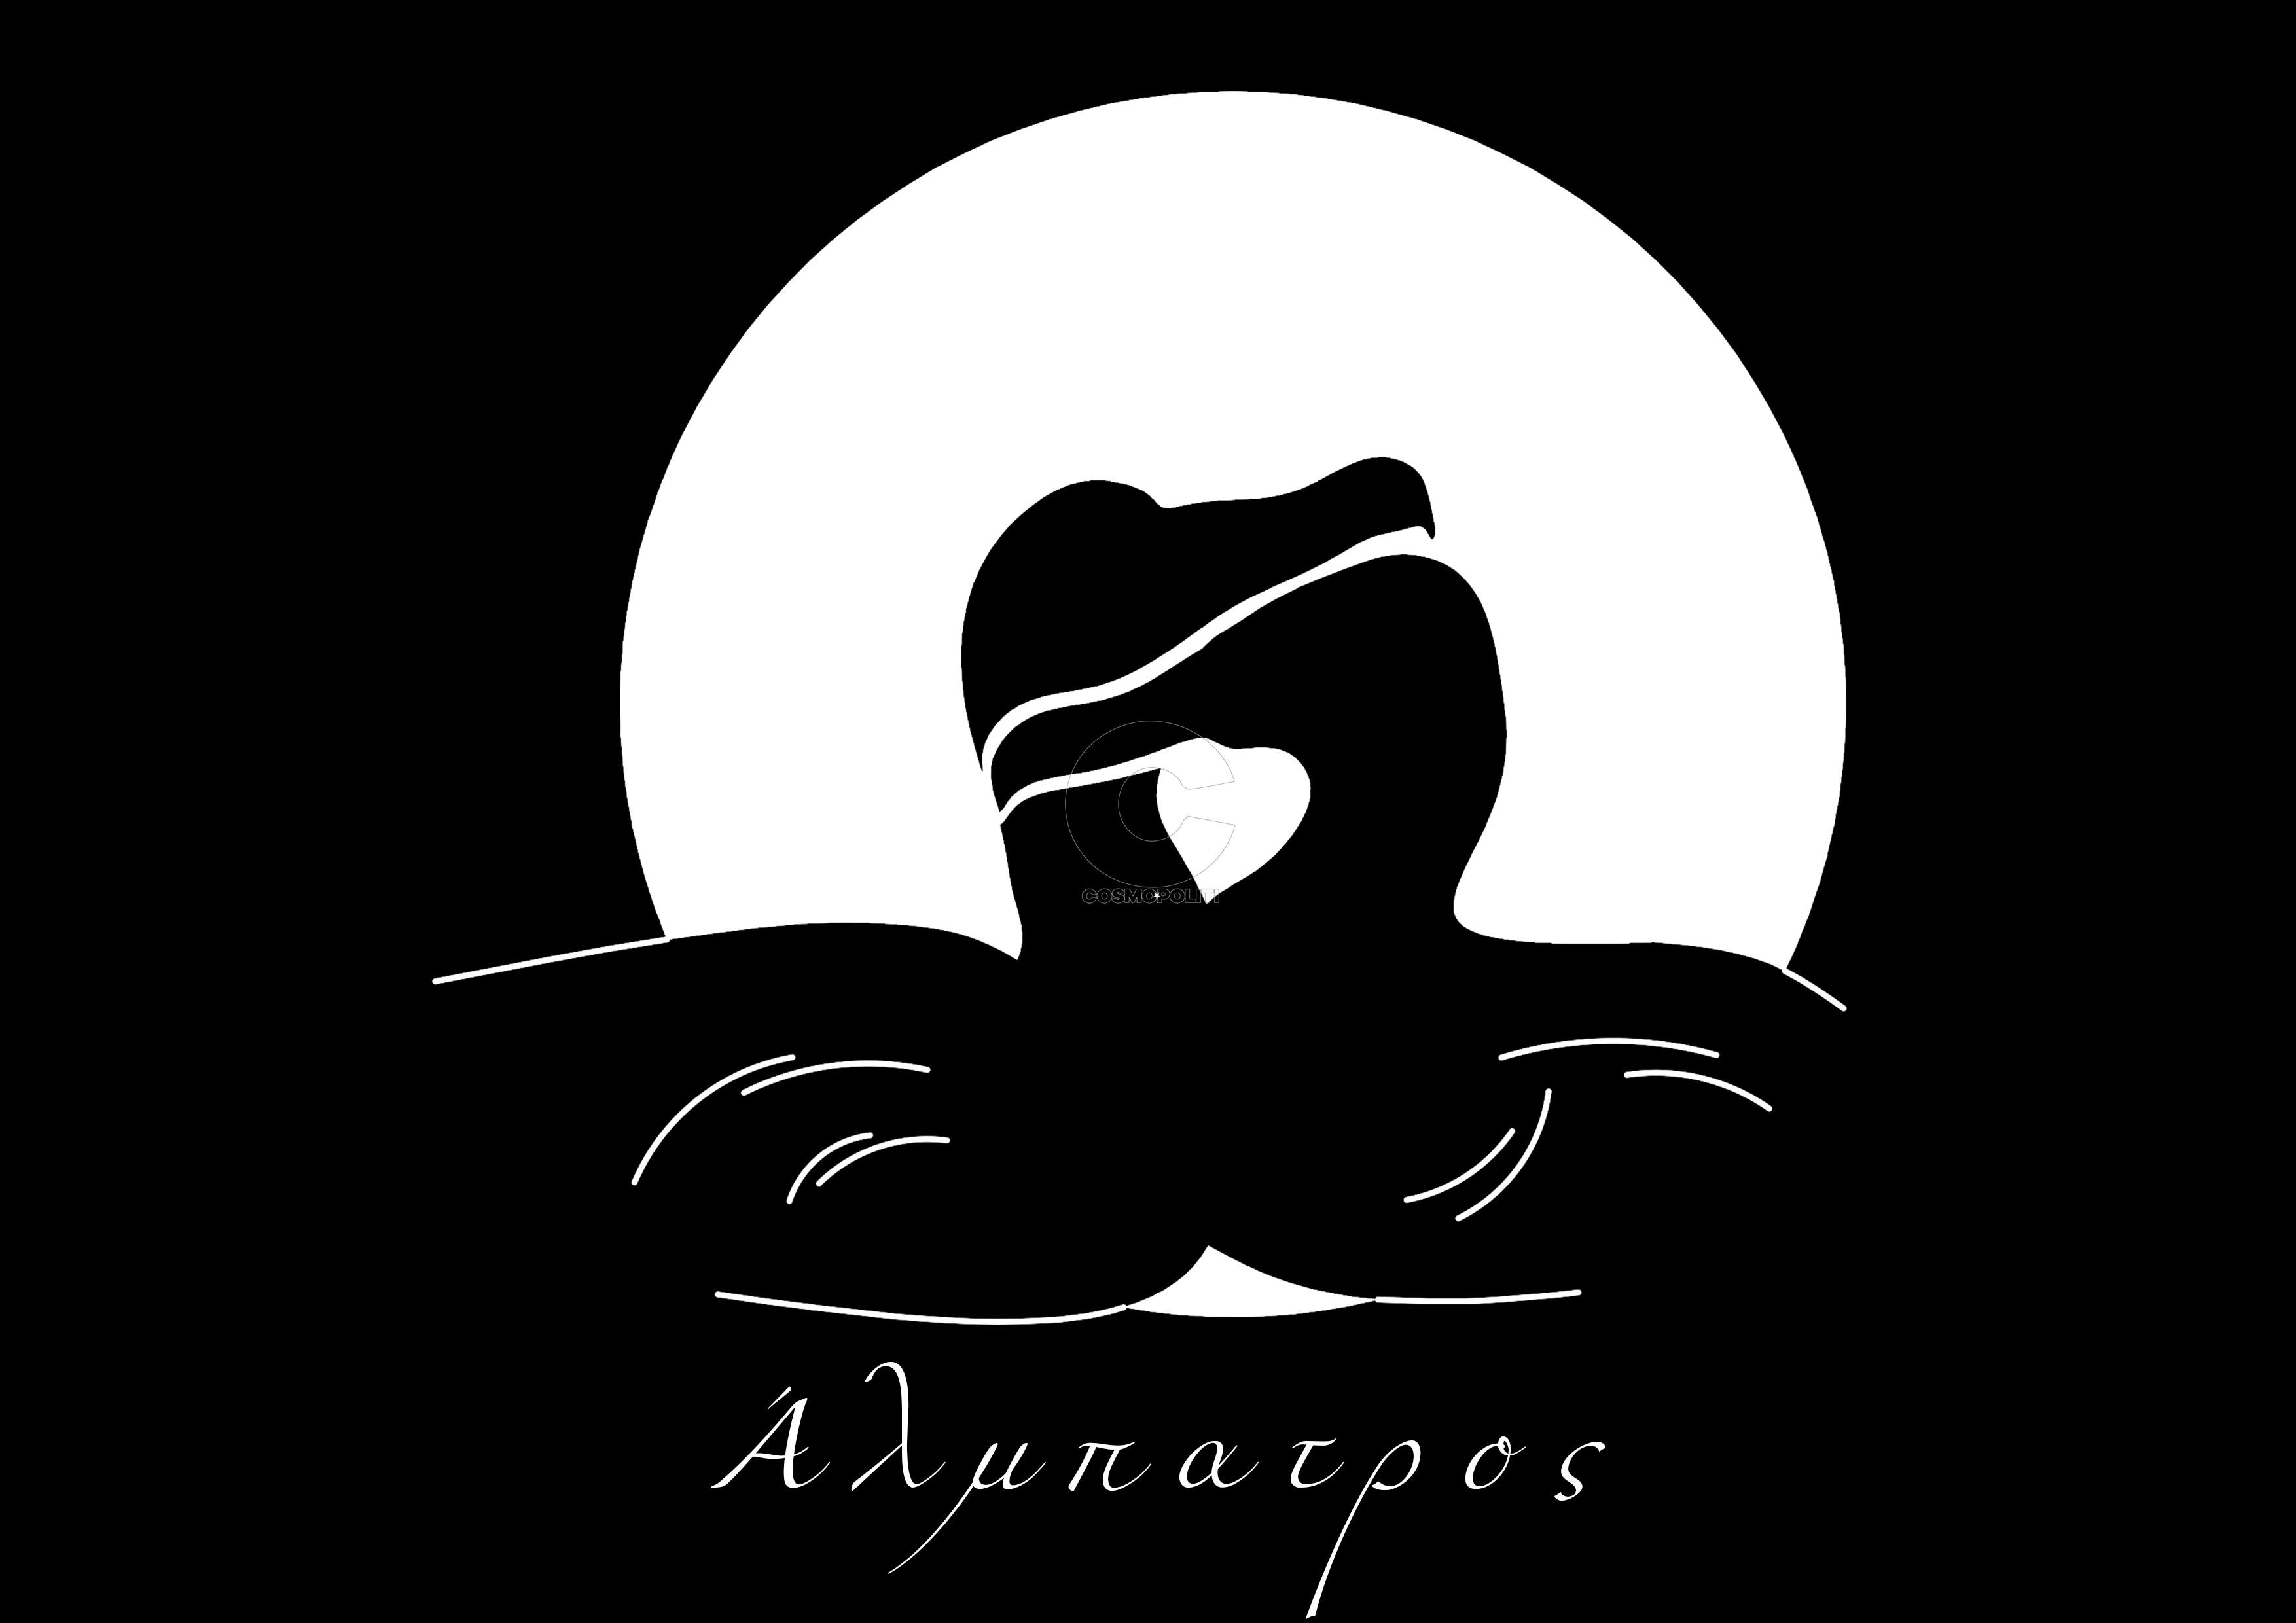 00 albatross logo a4 black